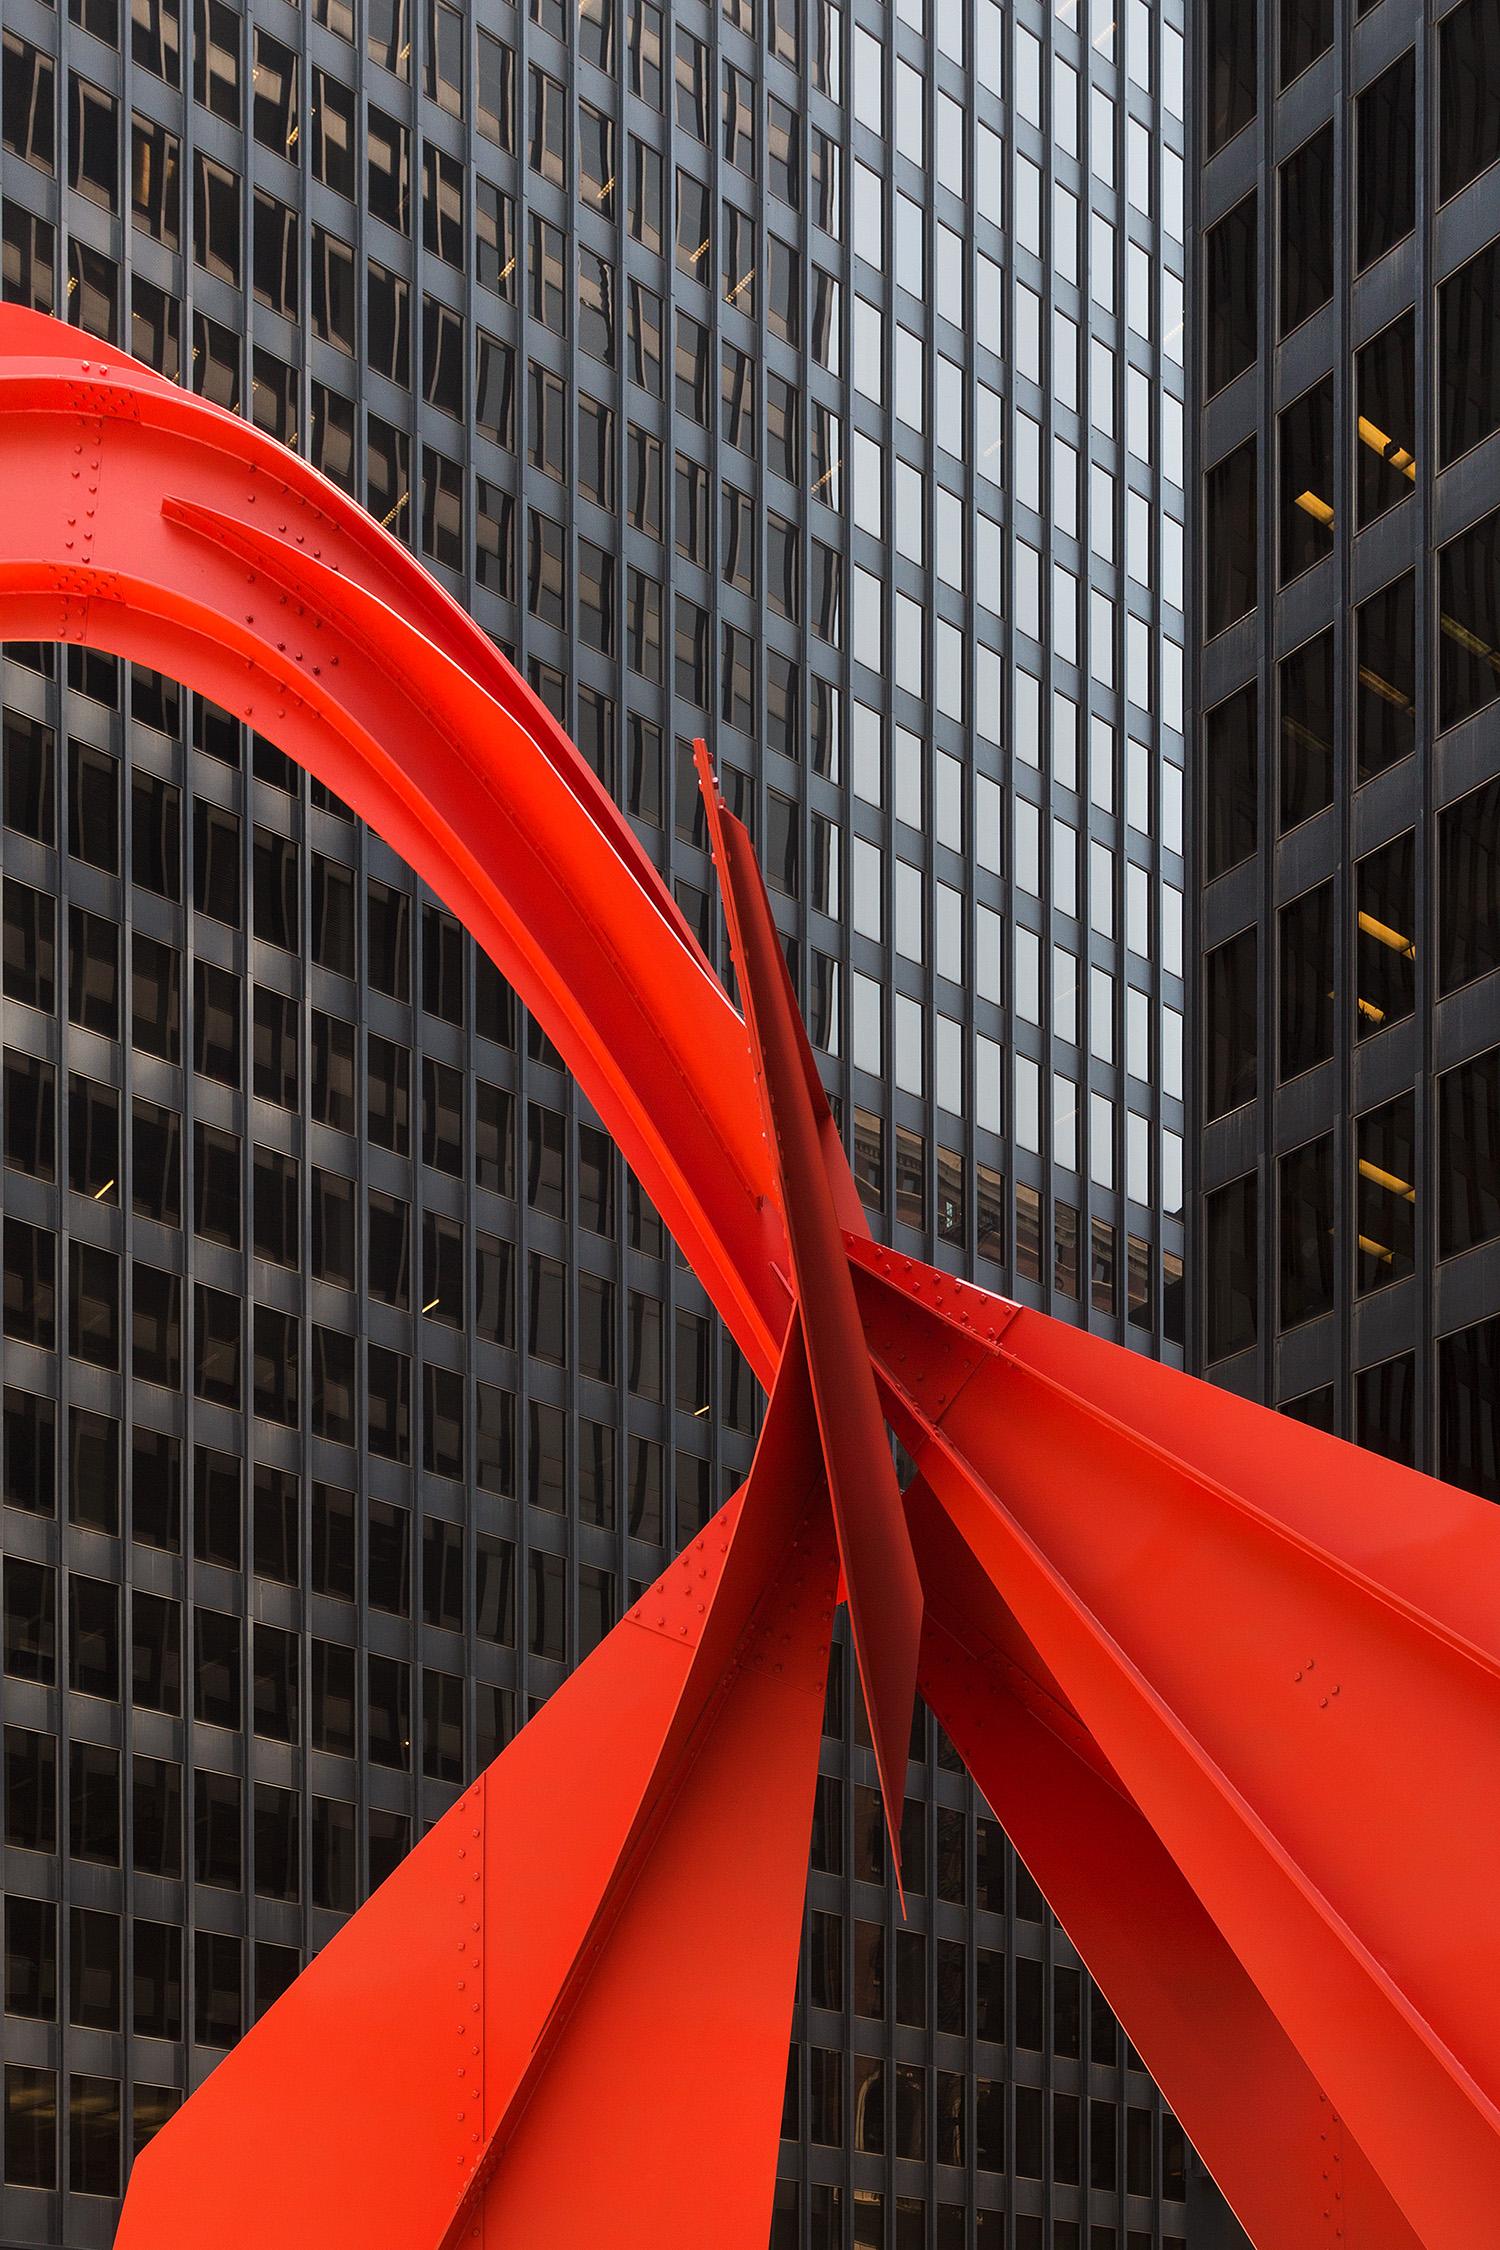 Federal Center / Chicago IL / Mies van der Rohe